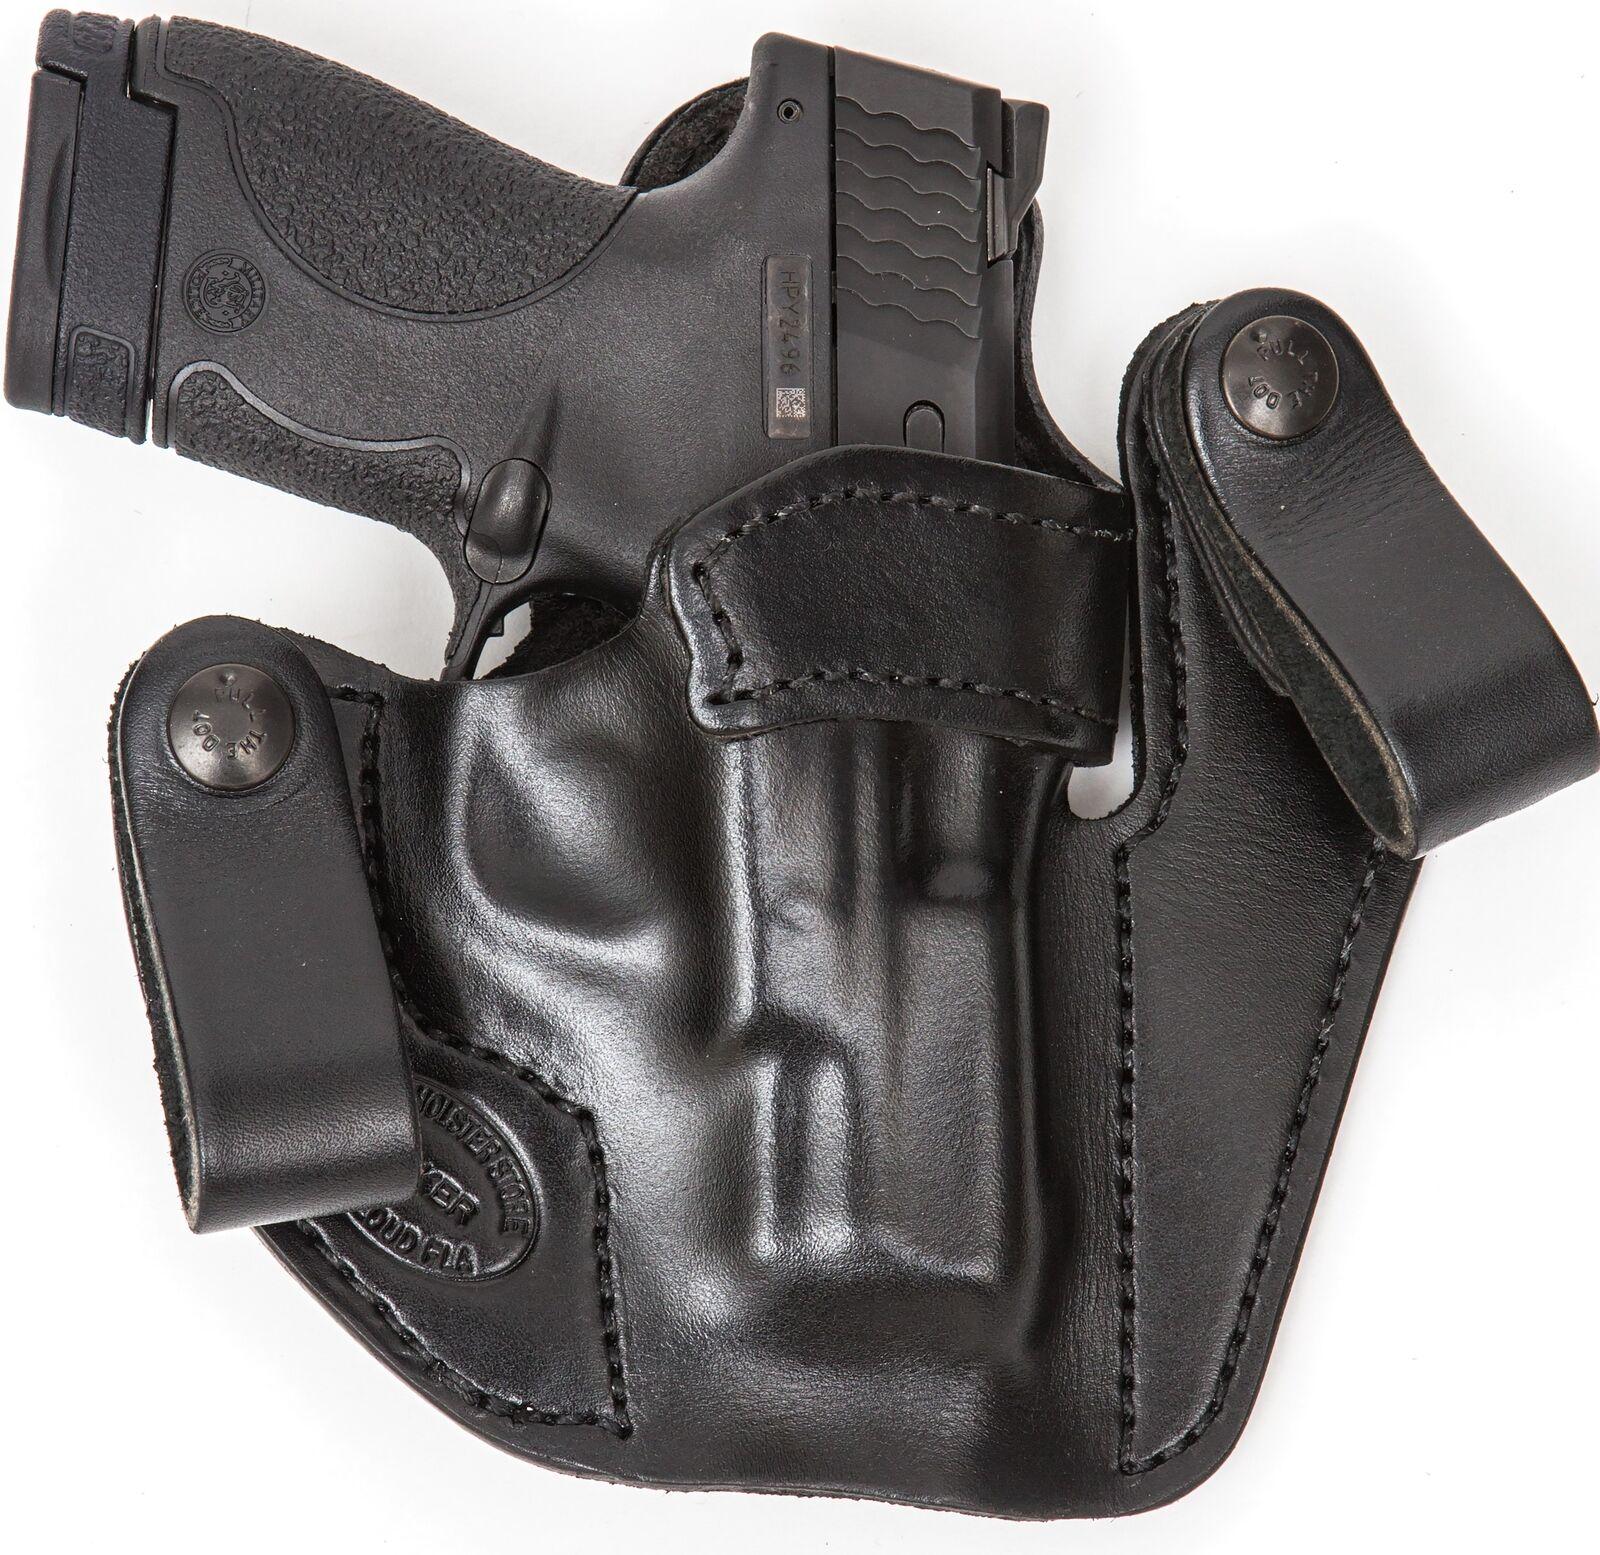 Xtreme llevar RH LH IWB Cuero Funda Pistola Para Ruger LC9s